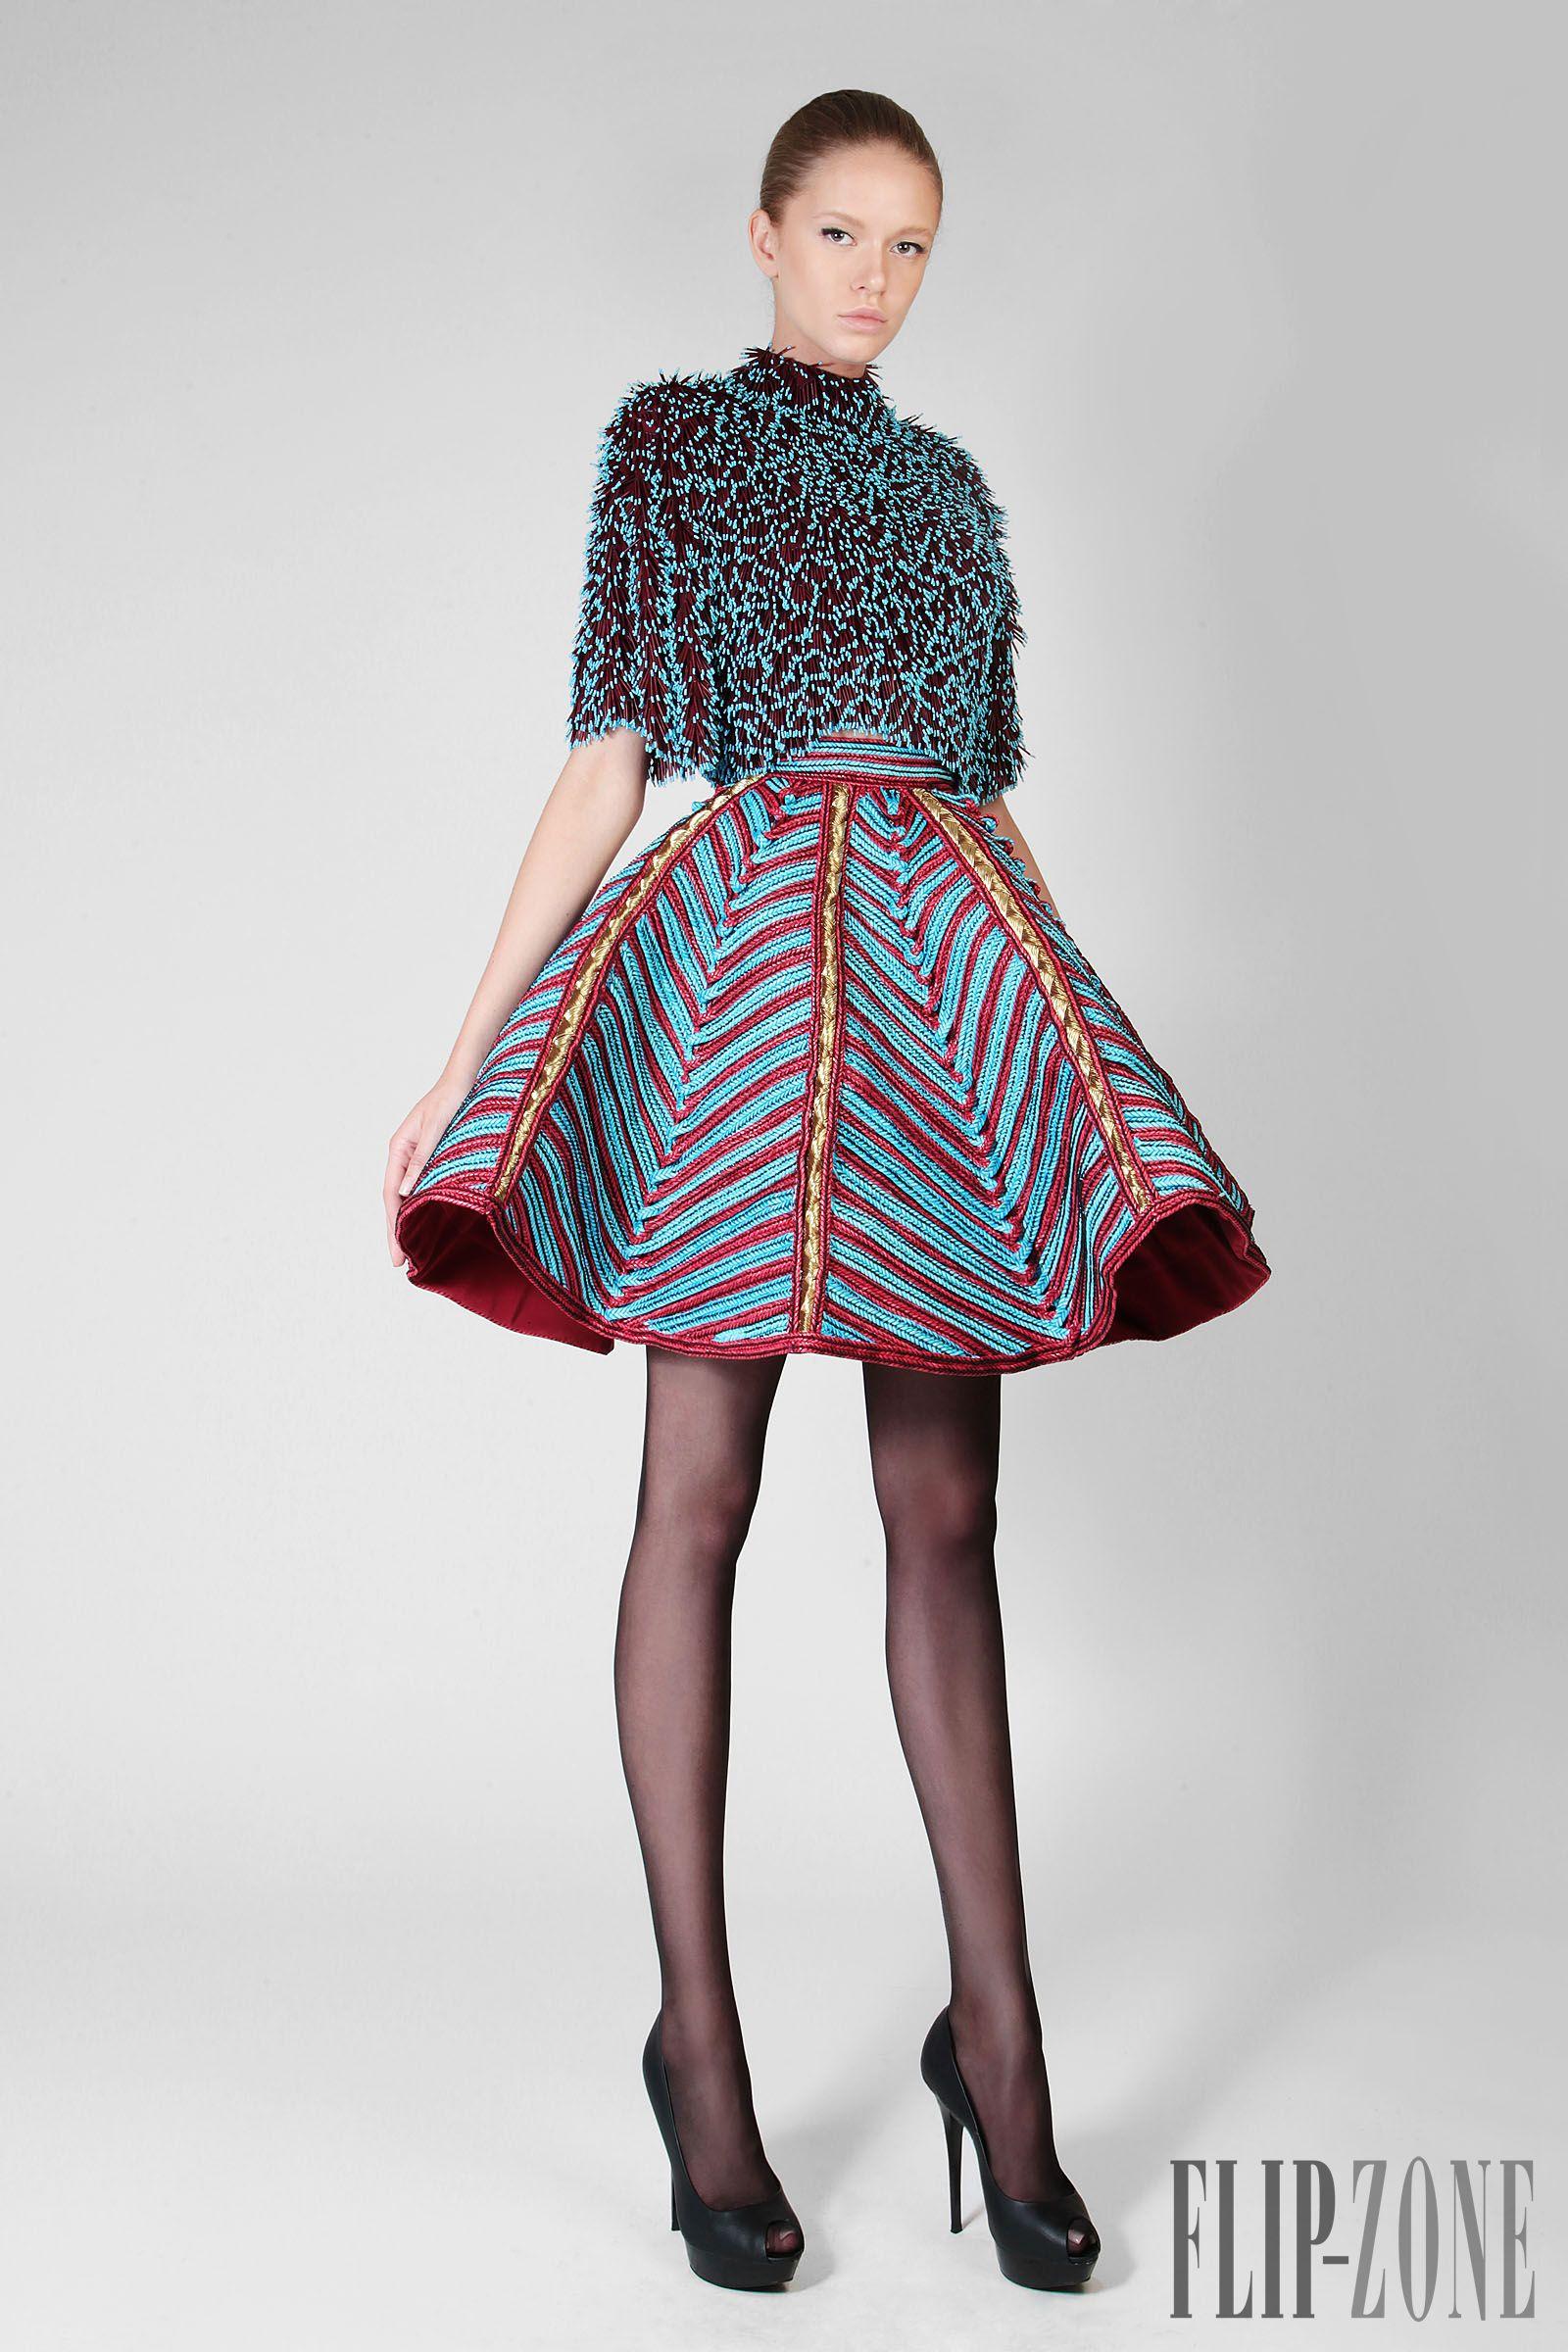 "Rami Kadi ""Un souffle d'Orient"", F/W 2014-2015 - Couture - http://www.flip-zone.net/fashion/couture-1/independant-designers/rami-kadi-4818"